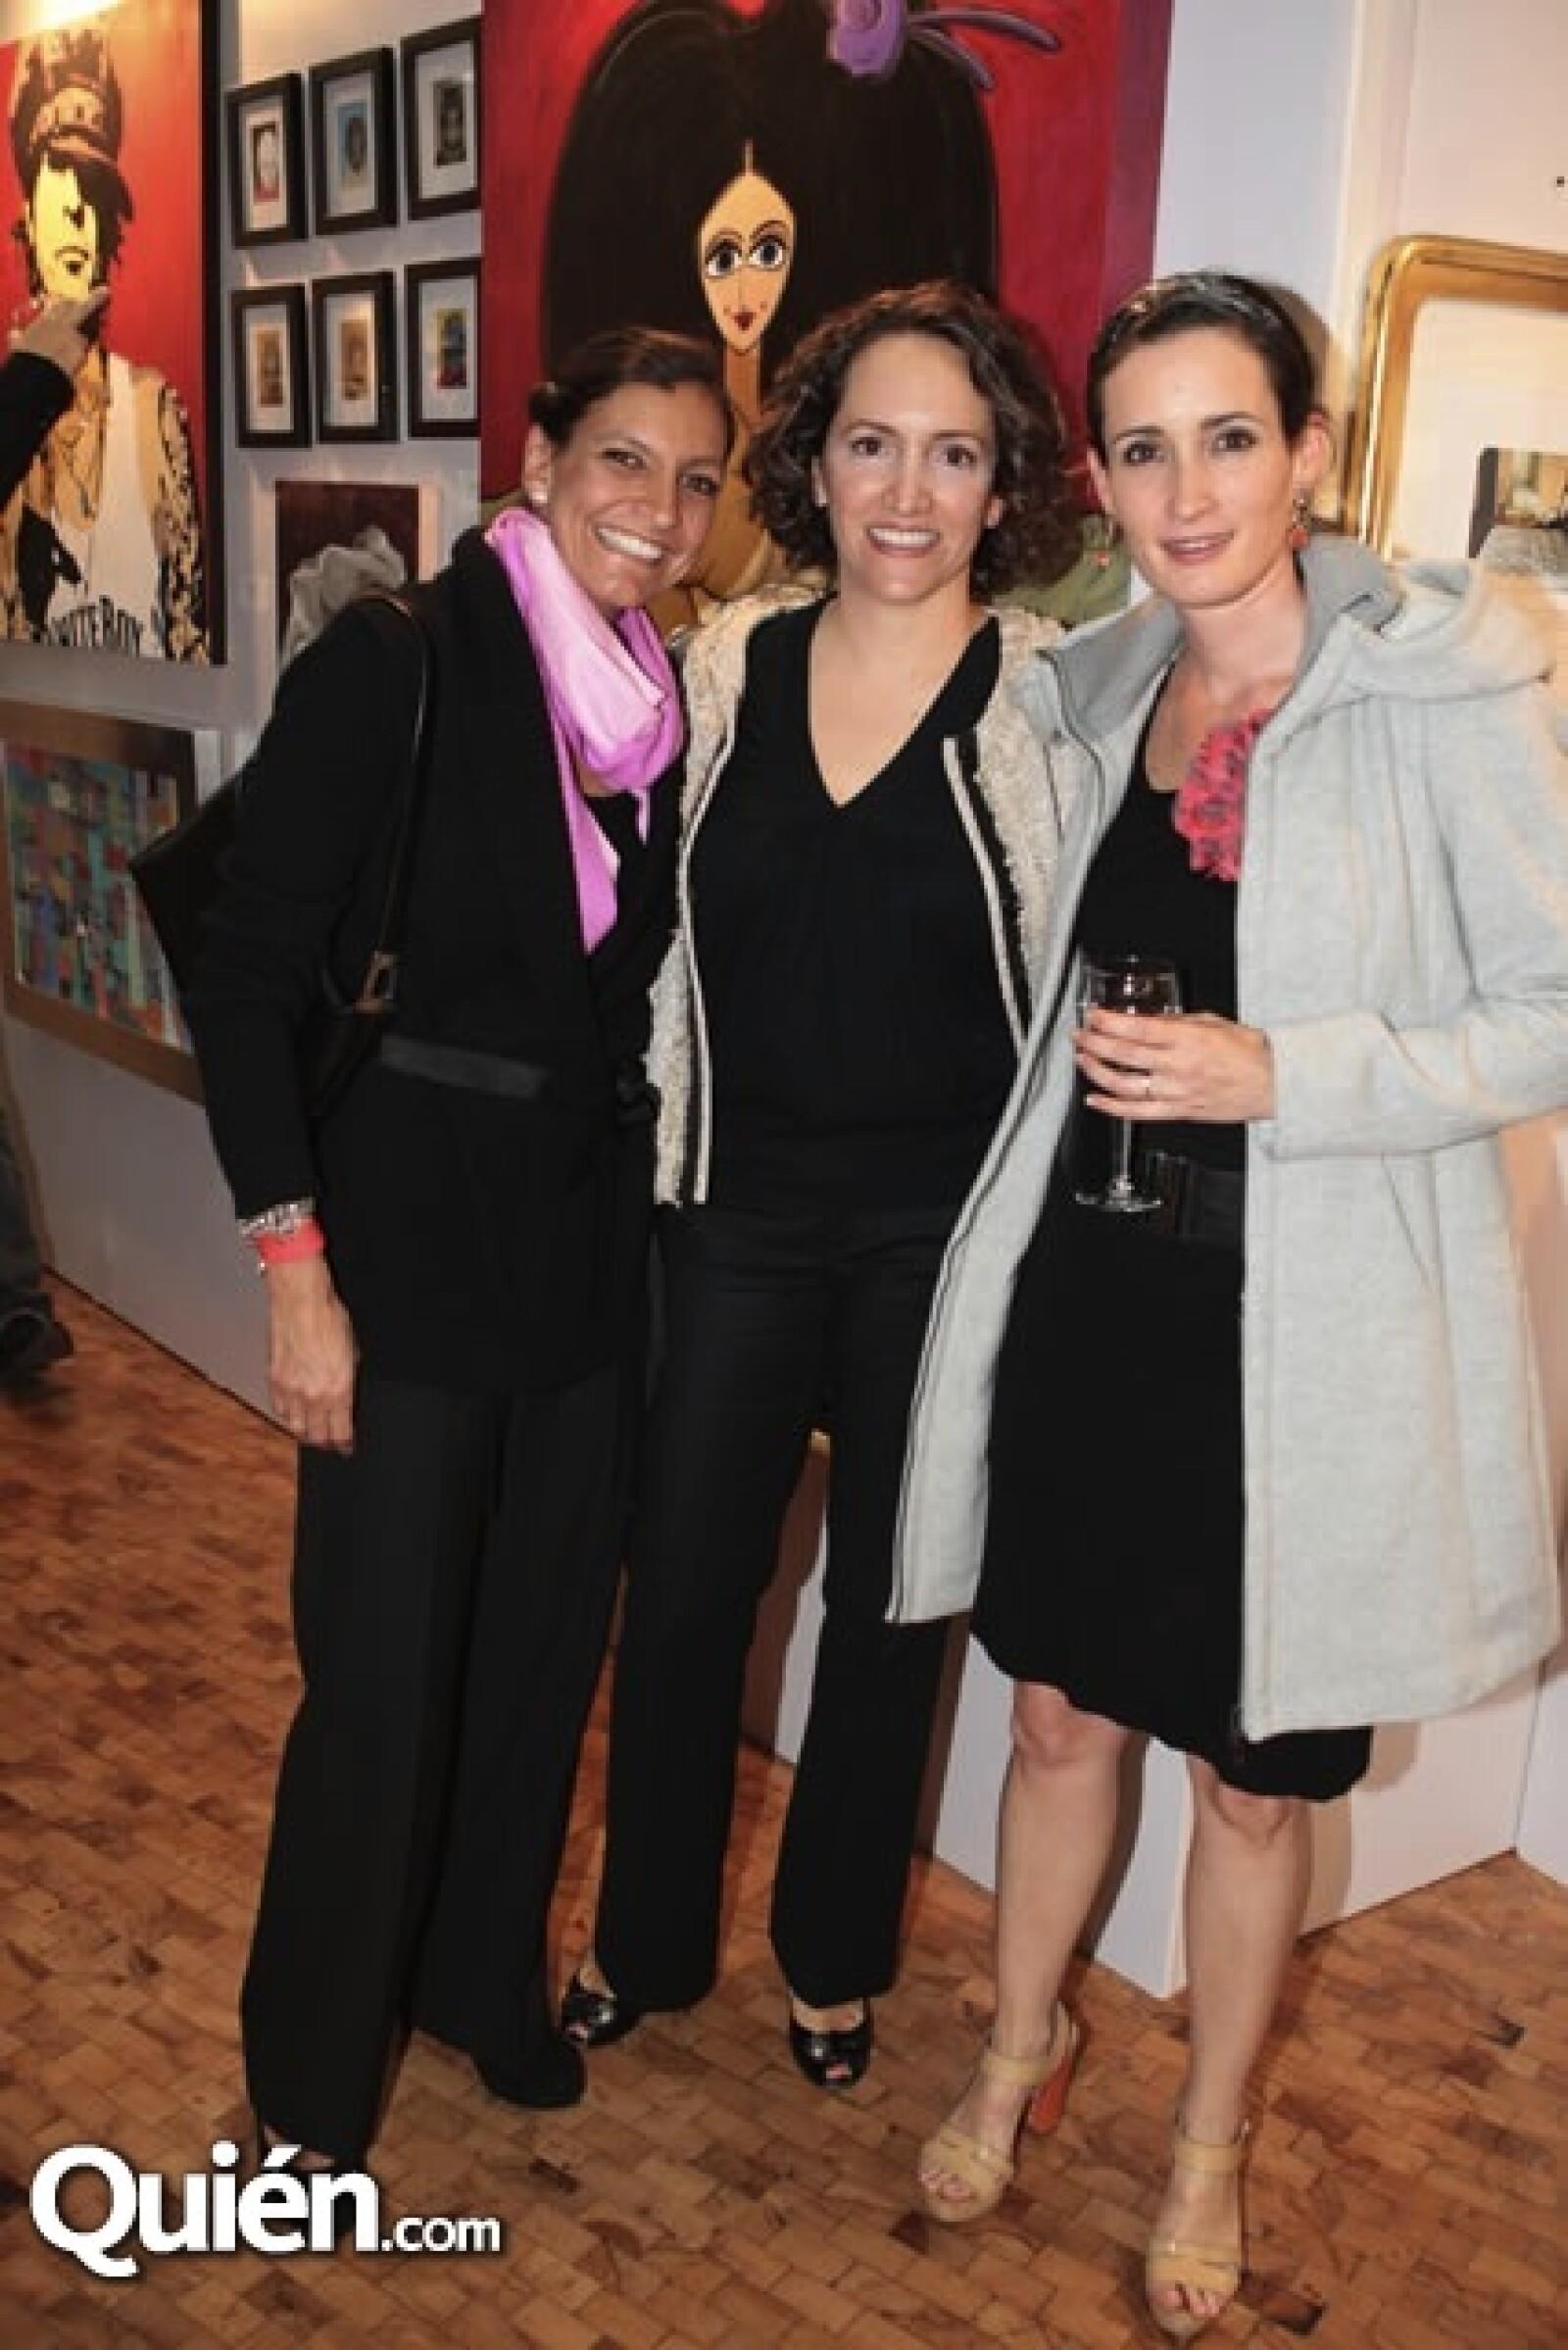 Cristina Olea, Ximena Guerrero, Michelle Woodblidge